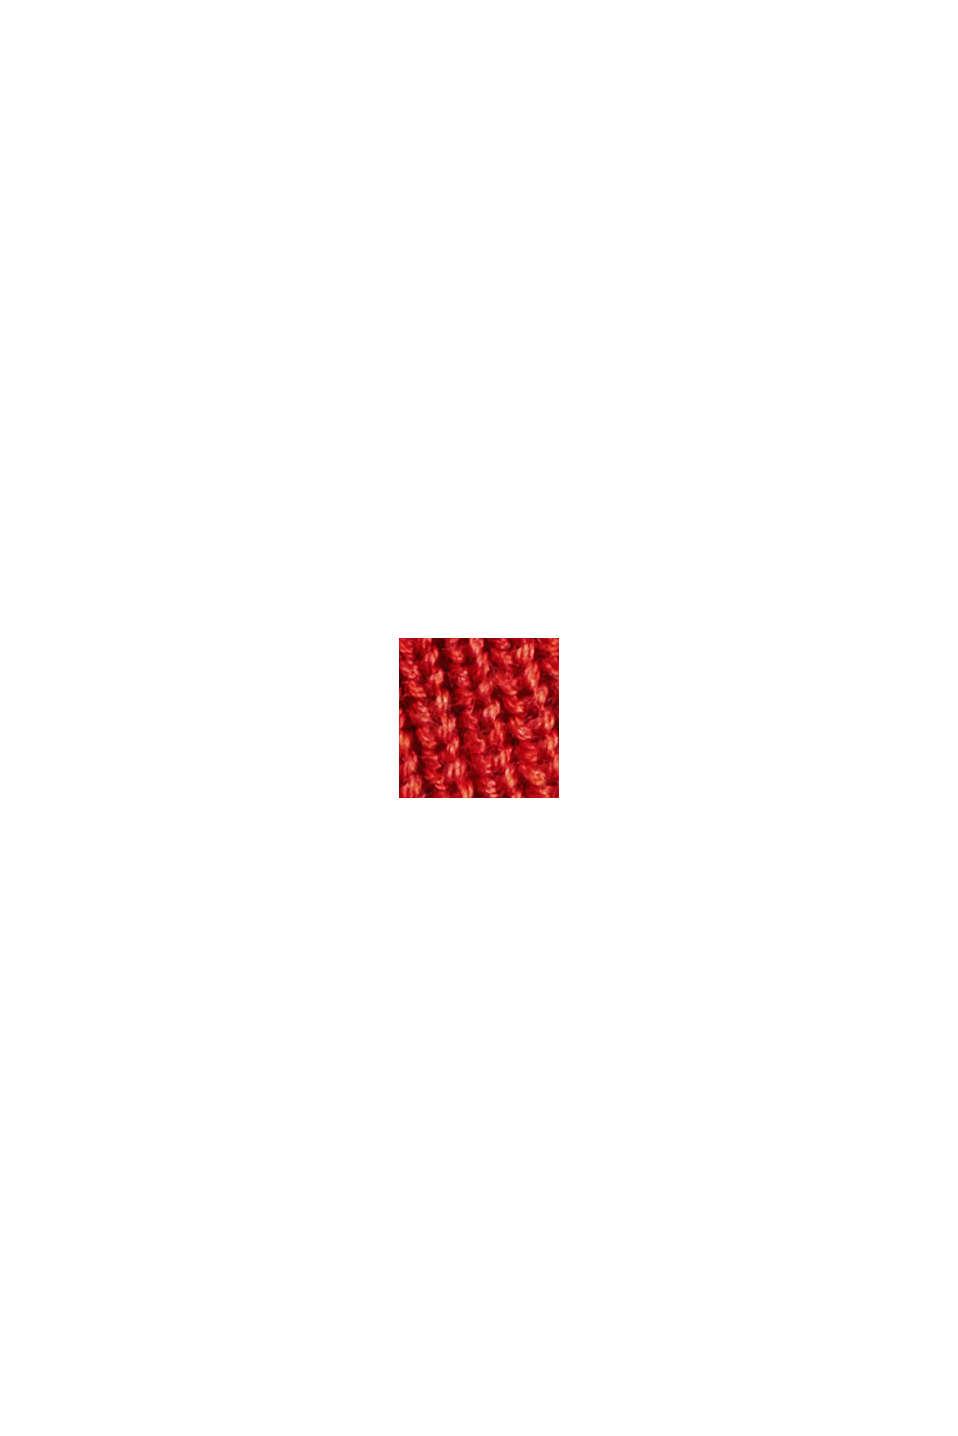 Pull-over en maille côtelée, 100% coton biologique, ORANGE, swatch